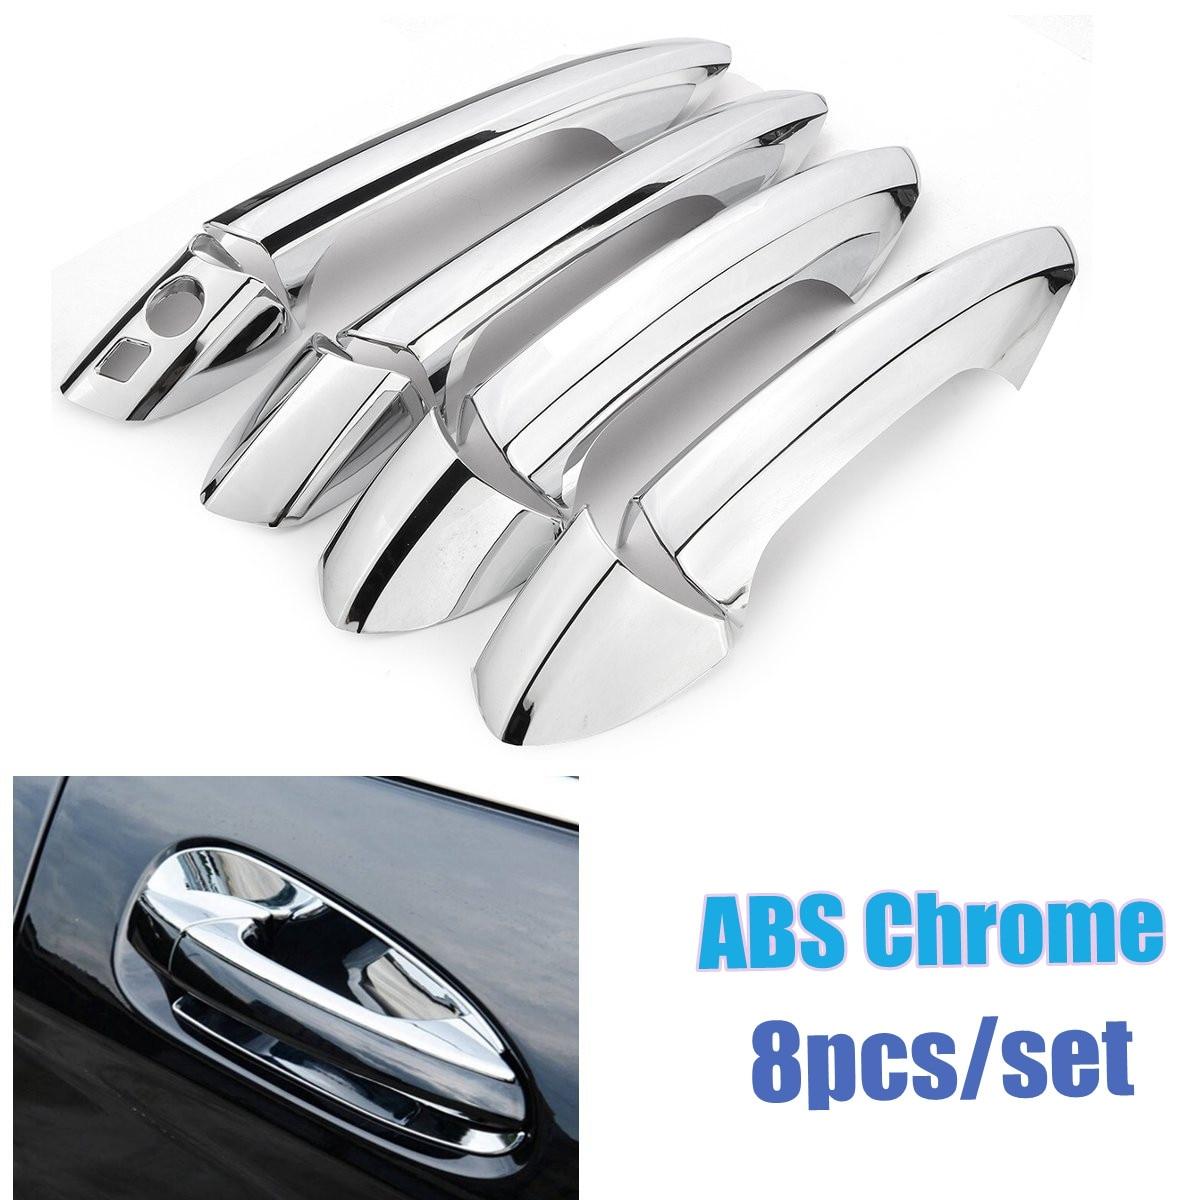 8 Uds manija de puerta lateral de cromo cubierta Set de molduras para Mercedes B/C/E/GLK/clase ML W246 W204 W212 X204 W166 W117